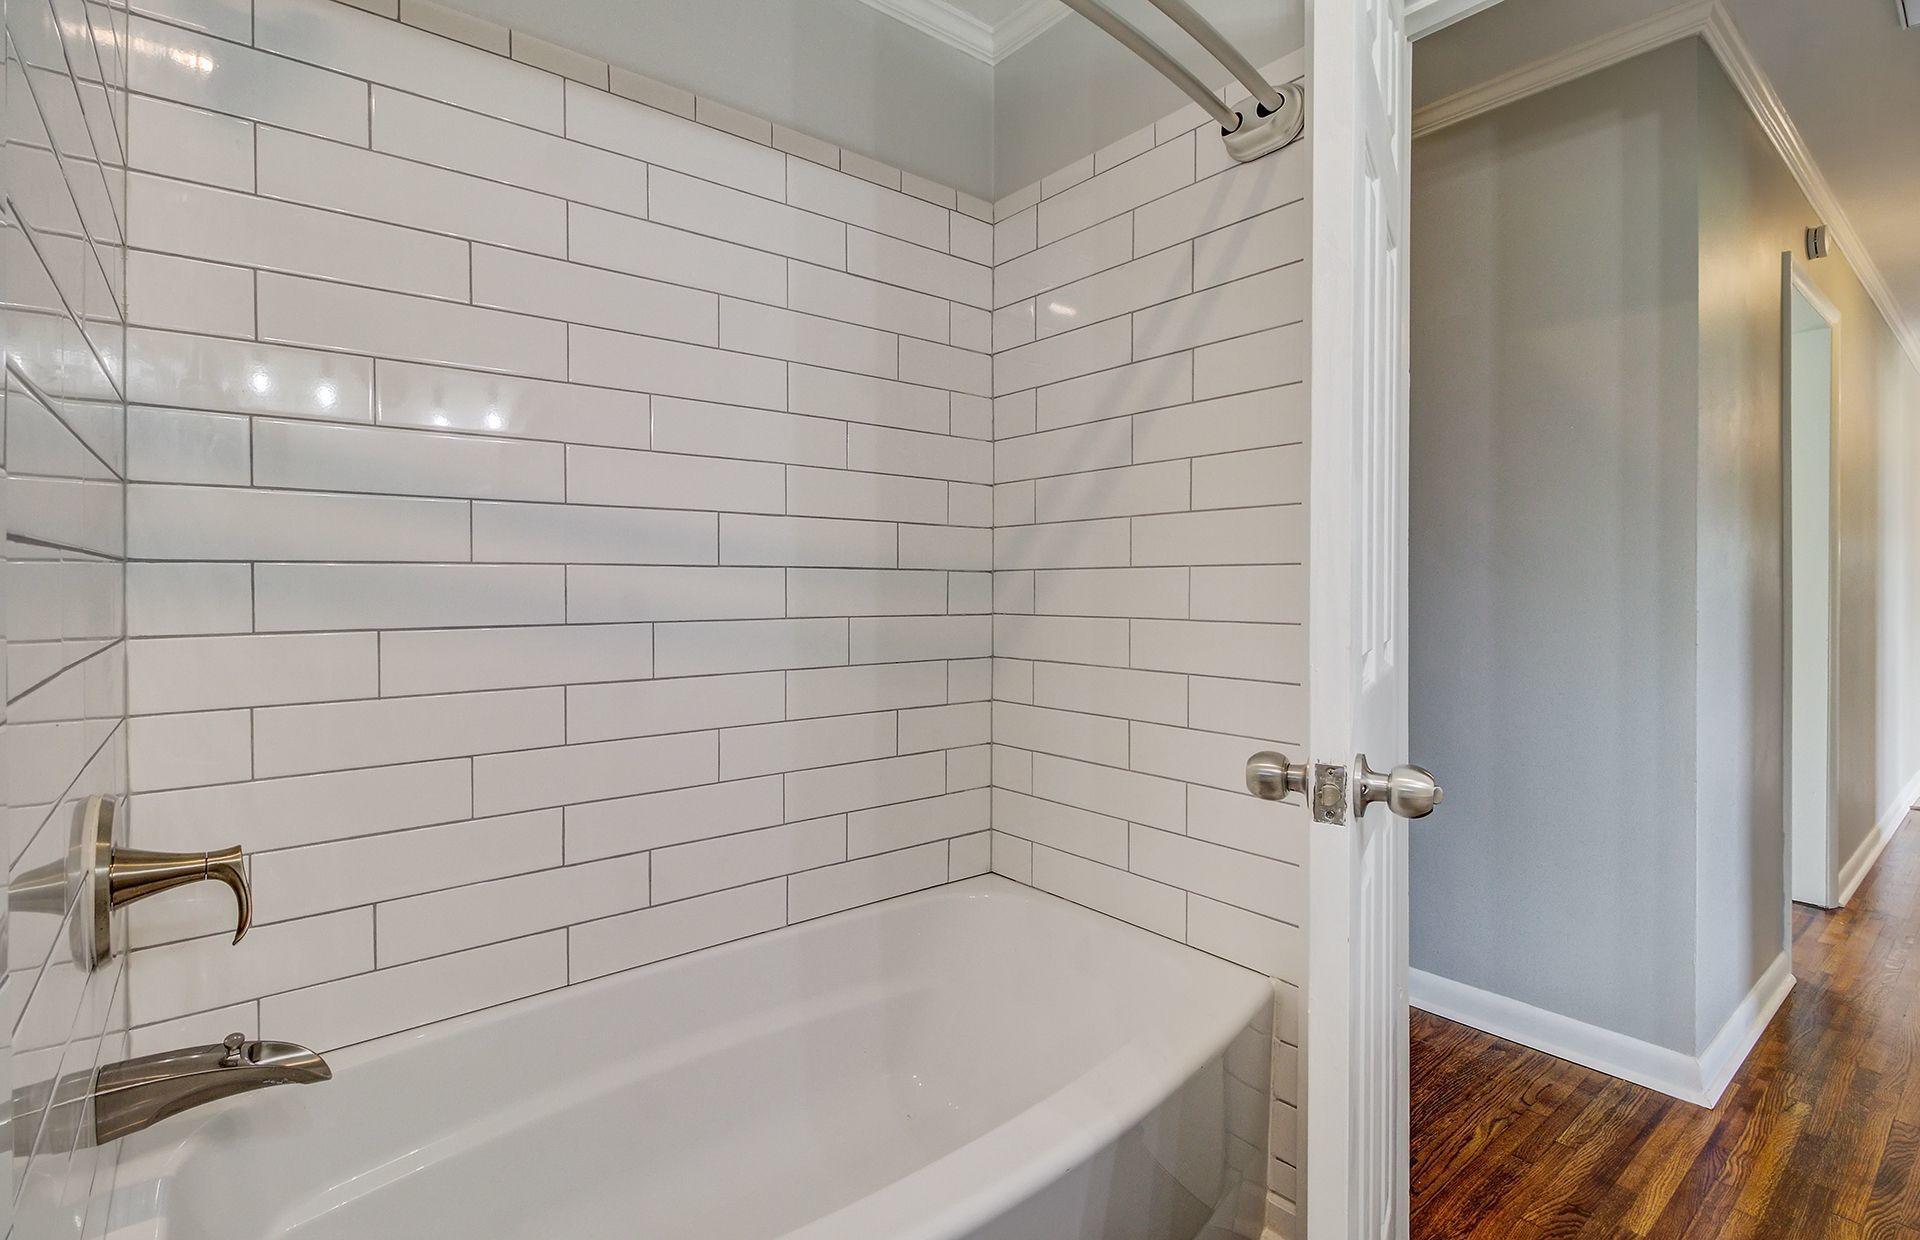 Belvedere Estates Homes For Sale - 6010 Ridgecrest, Hanahan, SC - 19